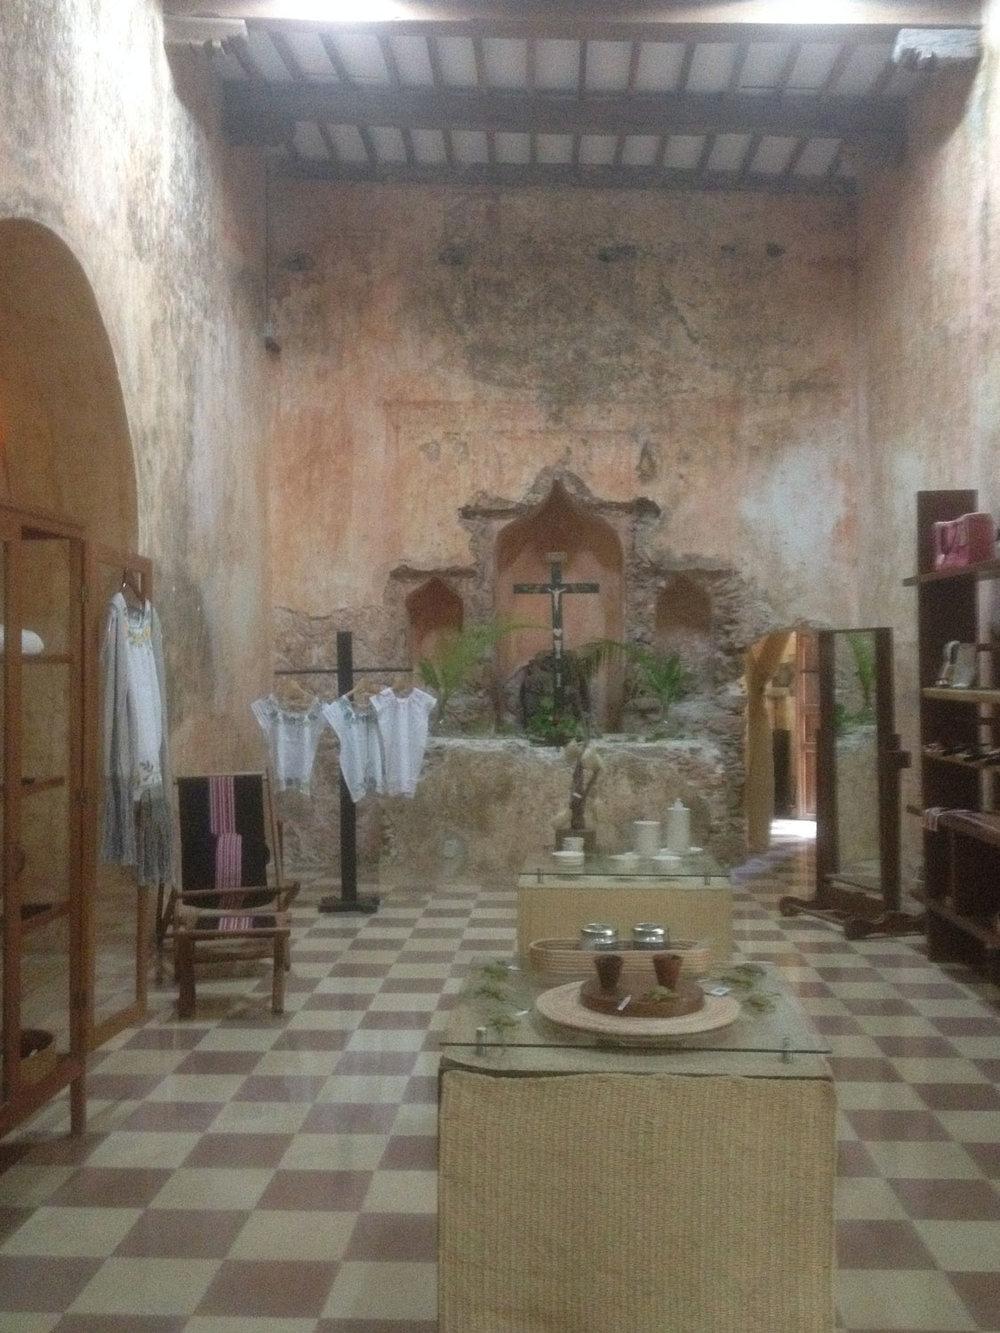 Hammocks_and_Ruins_Blog_Riviera_Maya_Mexico_Travel_Discover_Yucatan_What_to_do_Hacienda_Ochil_12.jpg